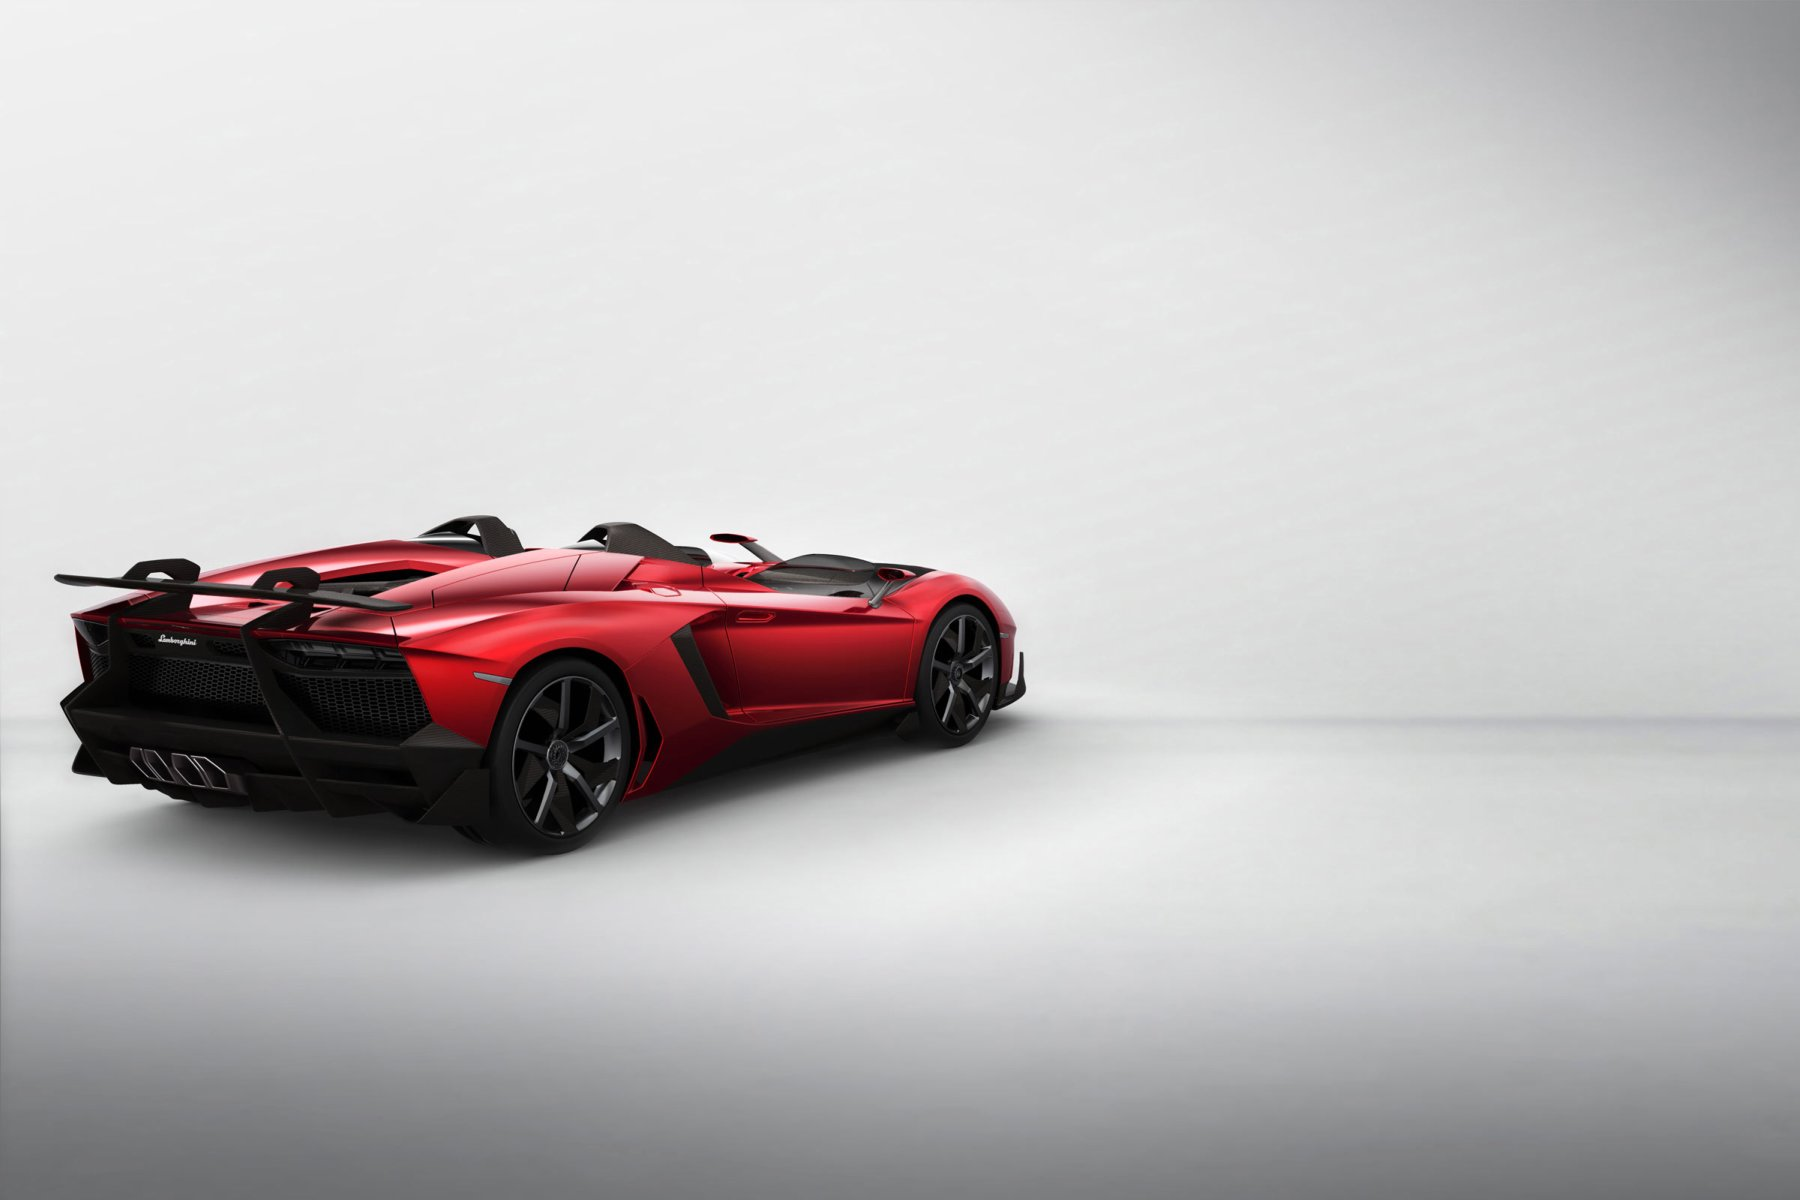 backgrounds4you_blogspot_com_car_21_Lamborghini